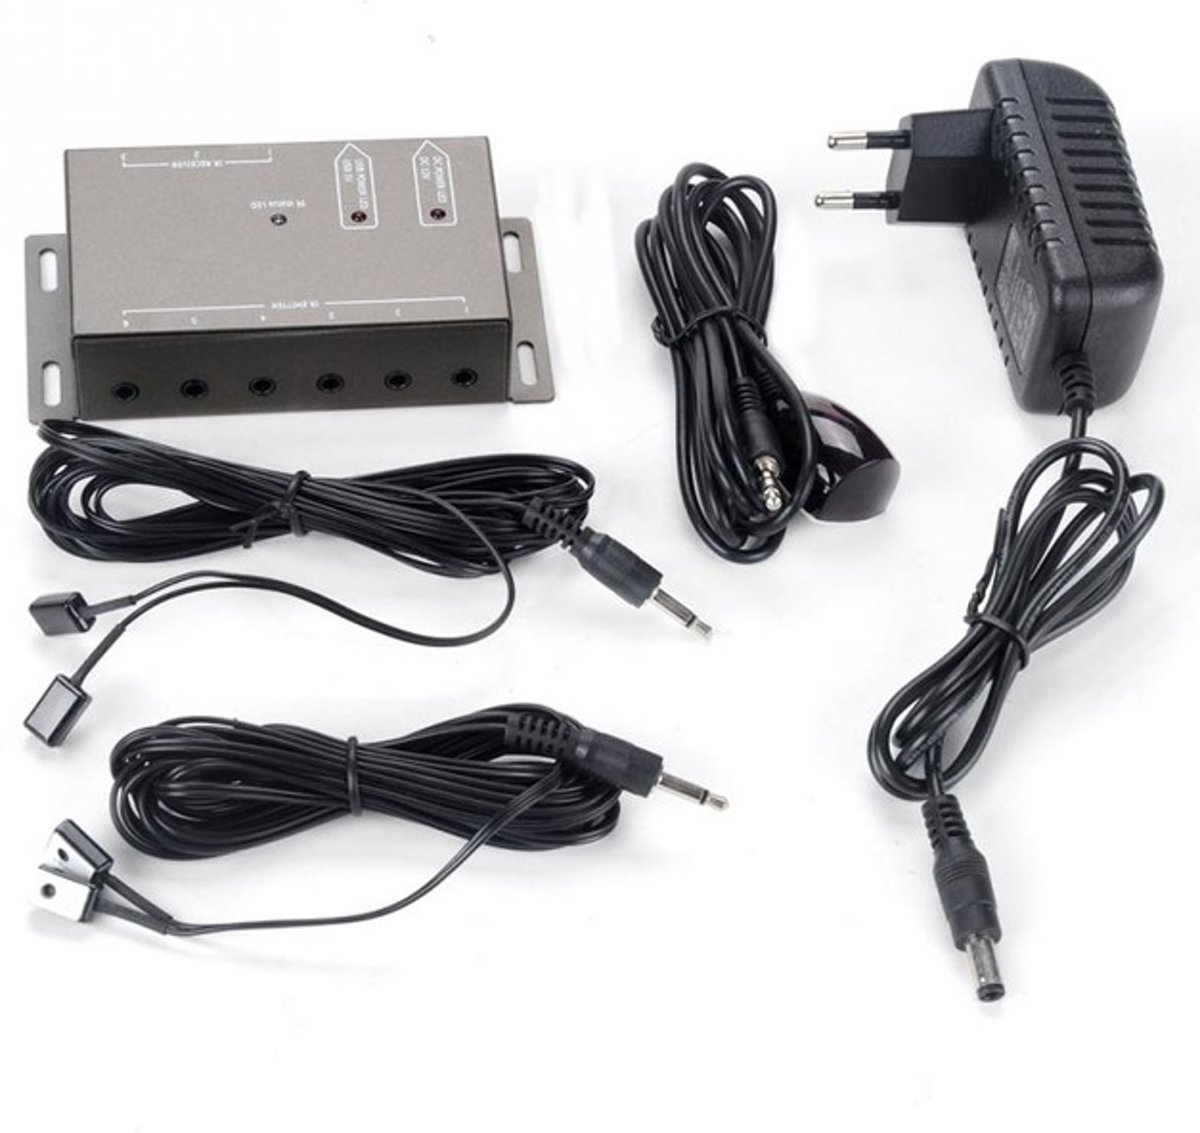 Infrarood Verlenger - IR Afstandsbediening Receiver Ontvanger & Transmitter - Remote Control Extender